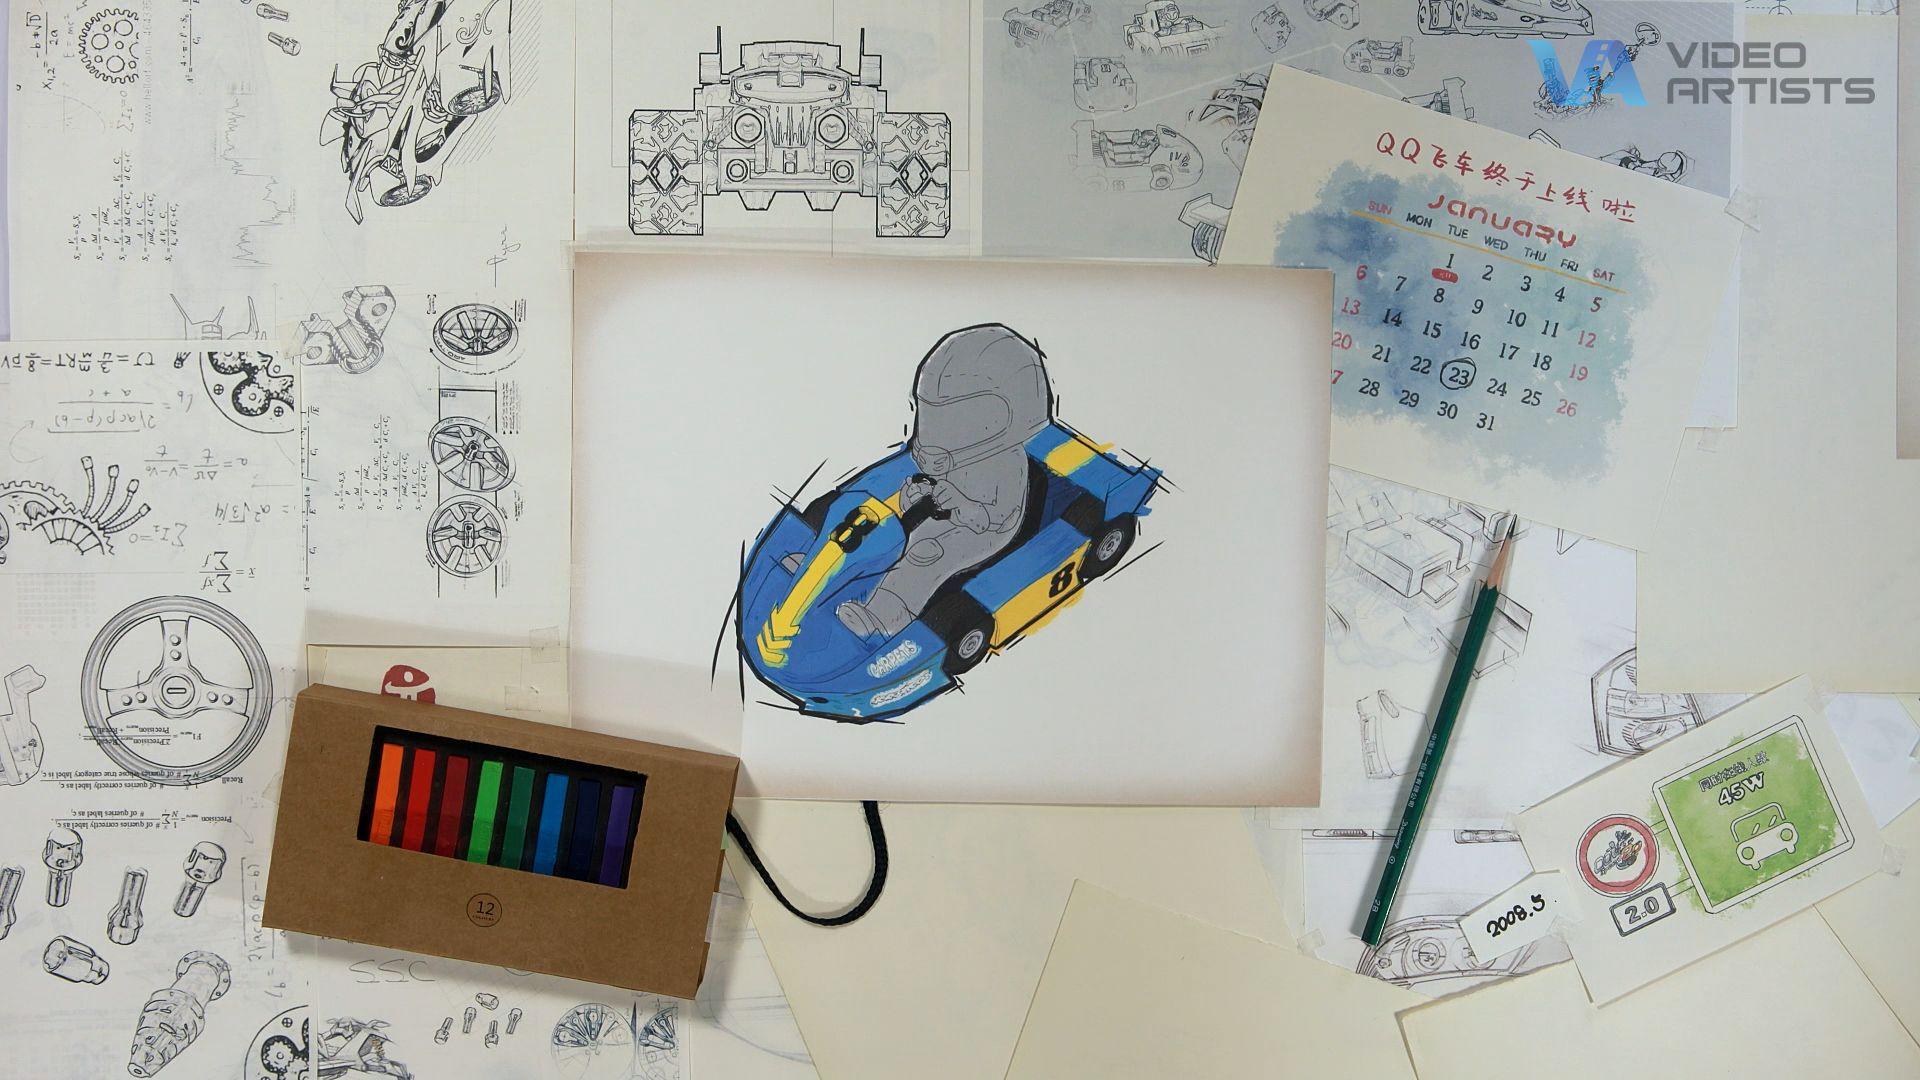 《QQ飞车》十周年折纸动画—宣传片